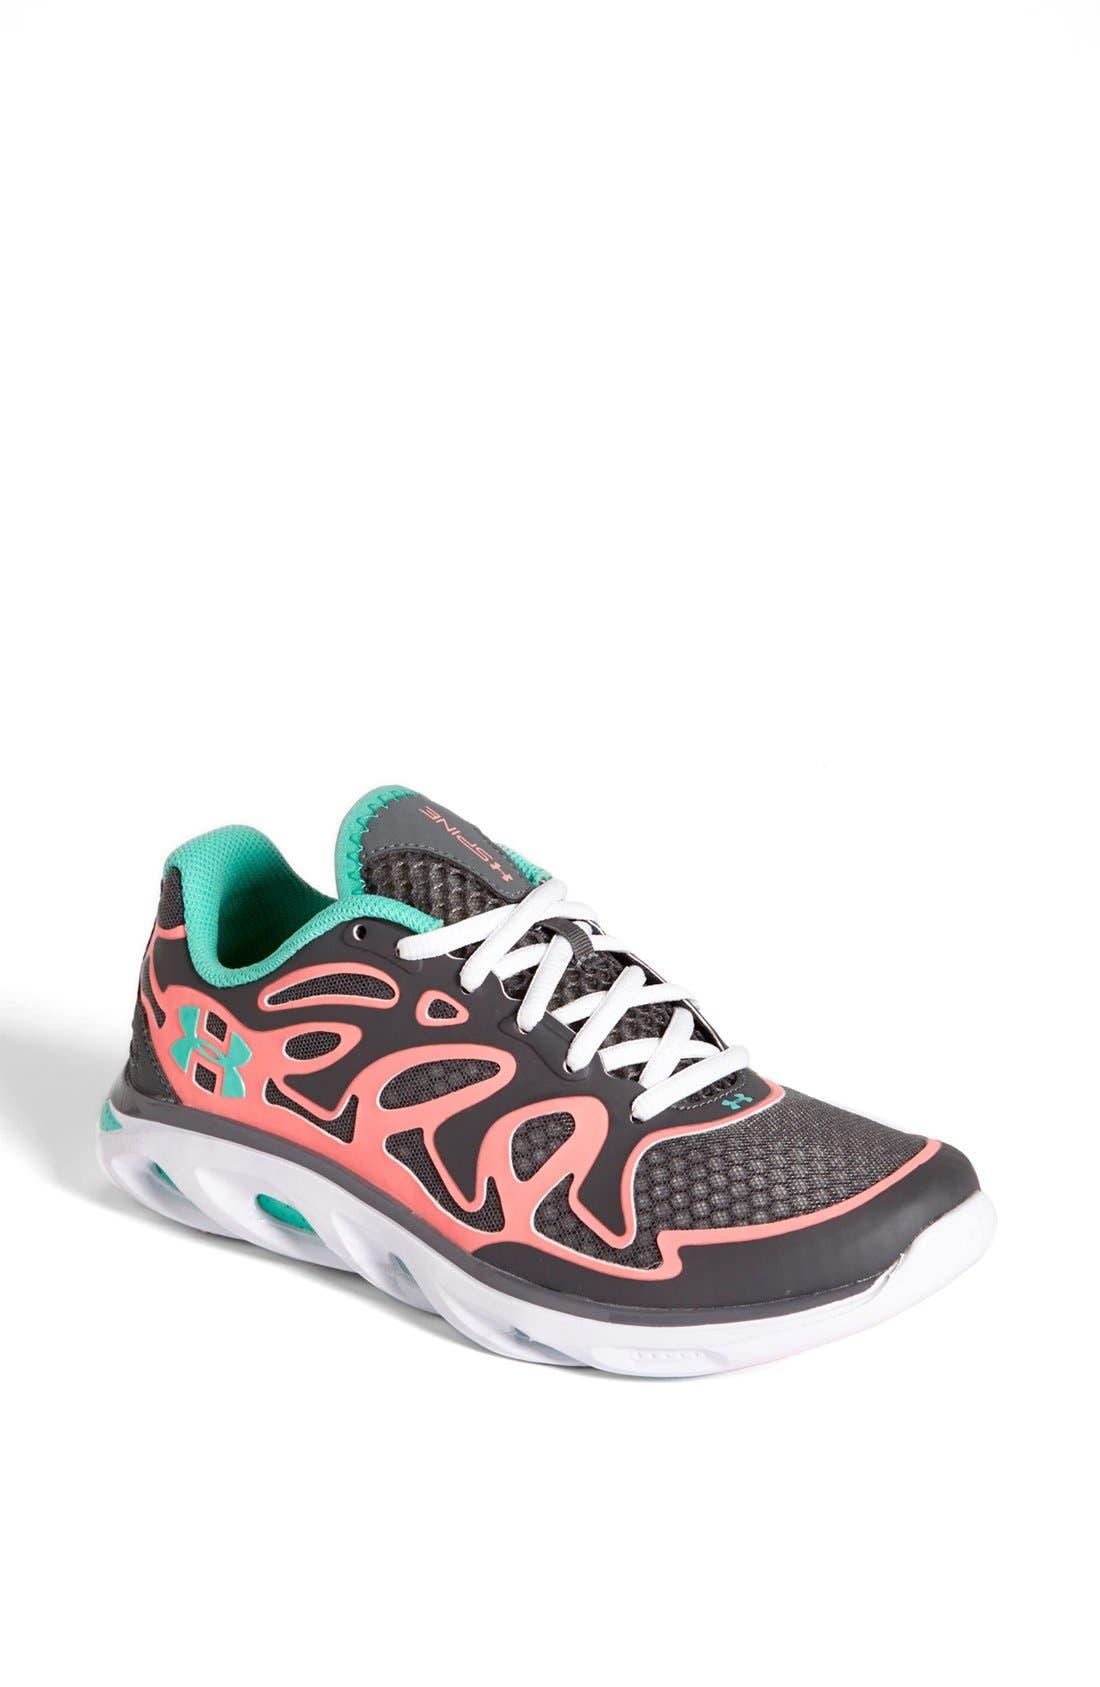 Alternate Image 1 Selected - Under Armour 'Spine™ Evo' Running Shoe (Women)